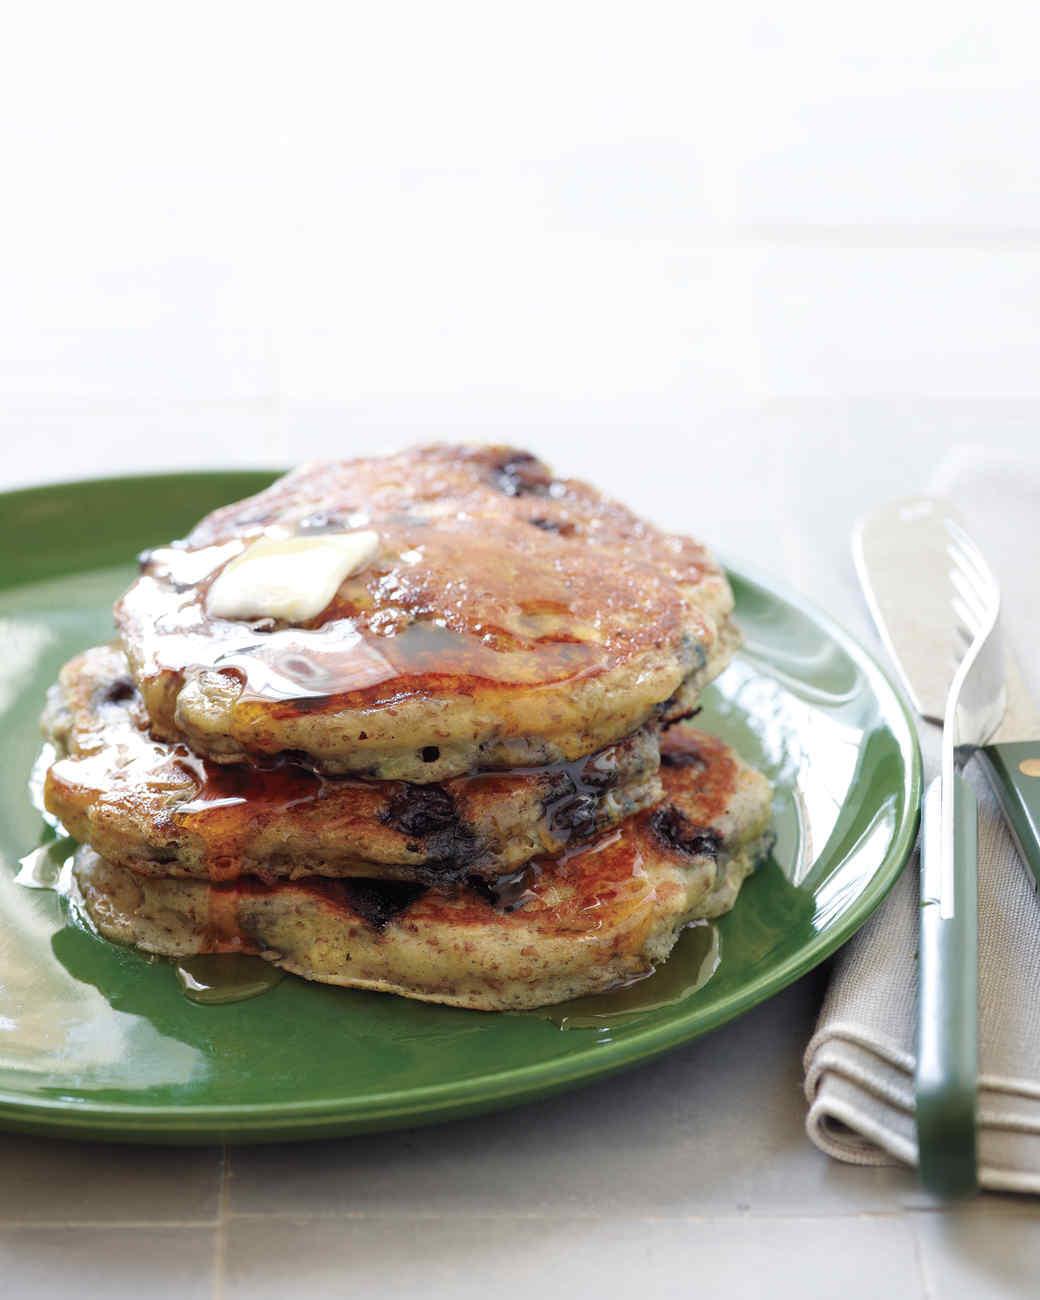 Blueberry-Flax Buttermilk Pancakes